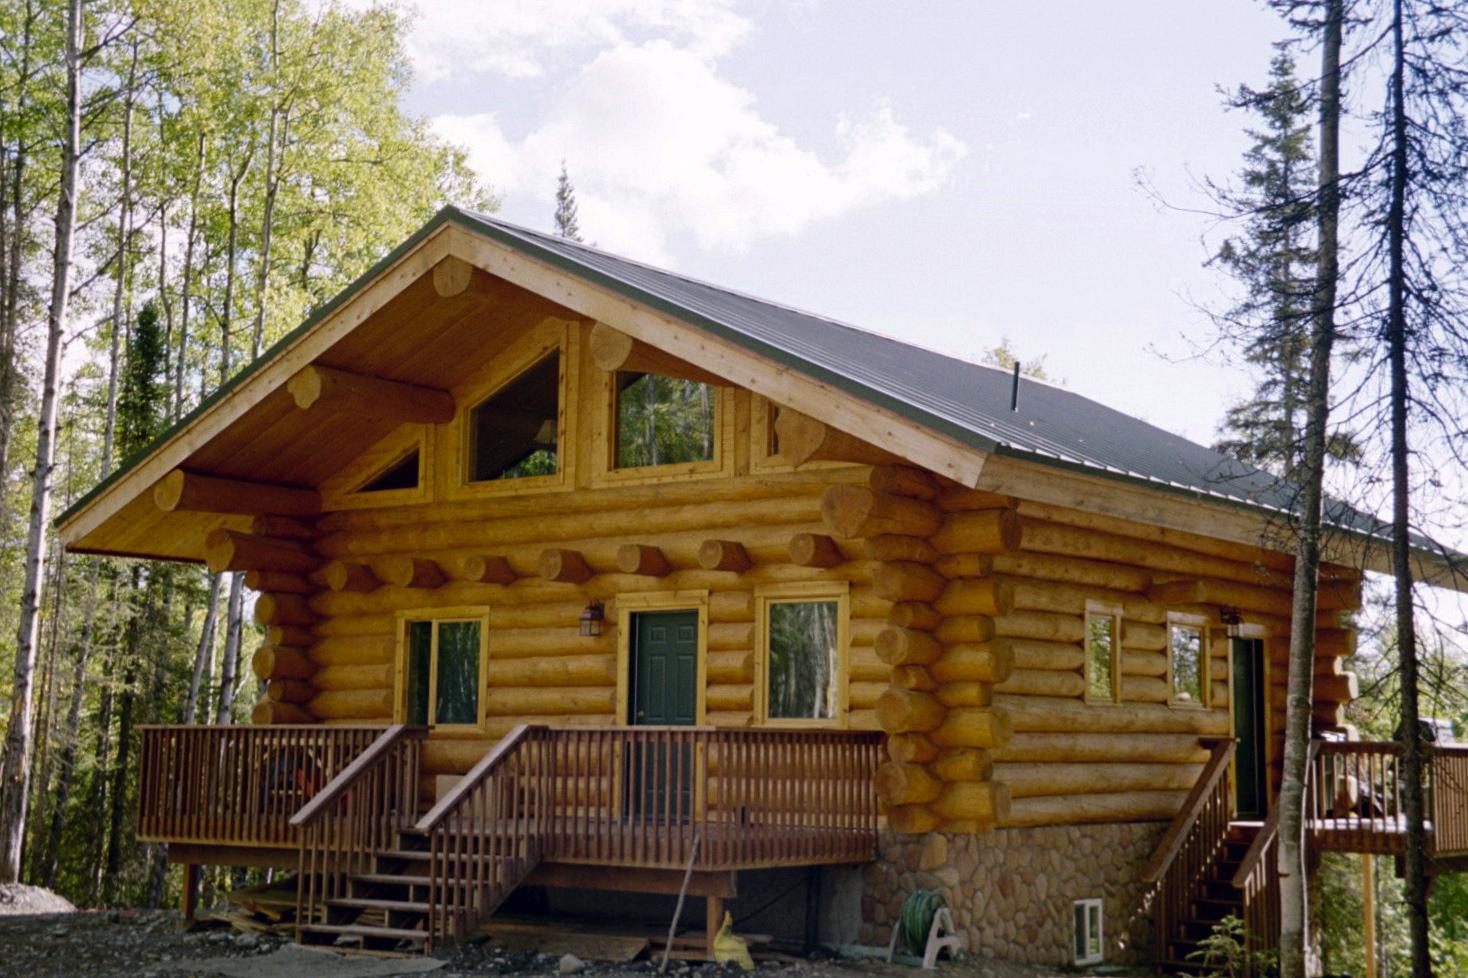 Haus Kaufen Alaska : alaska haus kaufen alaska log home alaska blockhaus blockh user haus pinterest alaska ~ Eleganceandgraceweddings.com Haus und Dekorationen